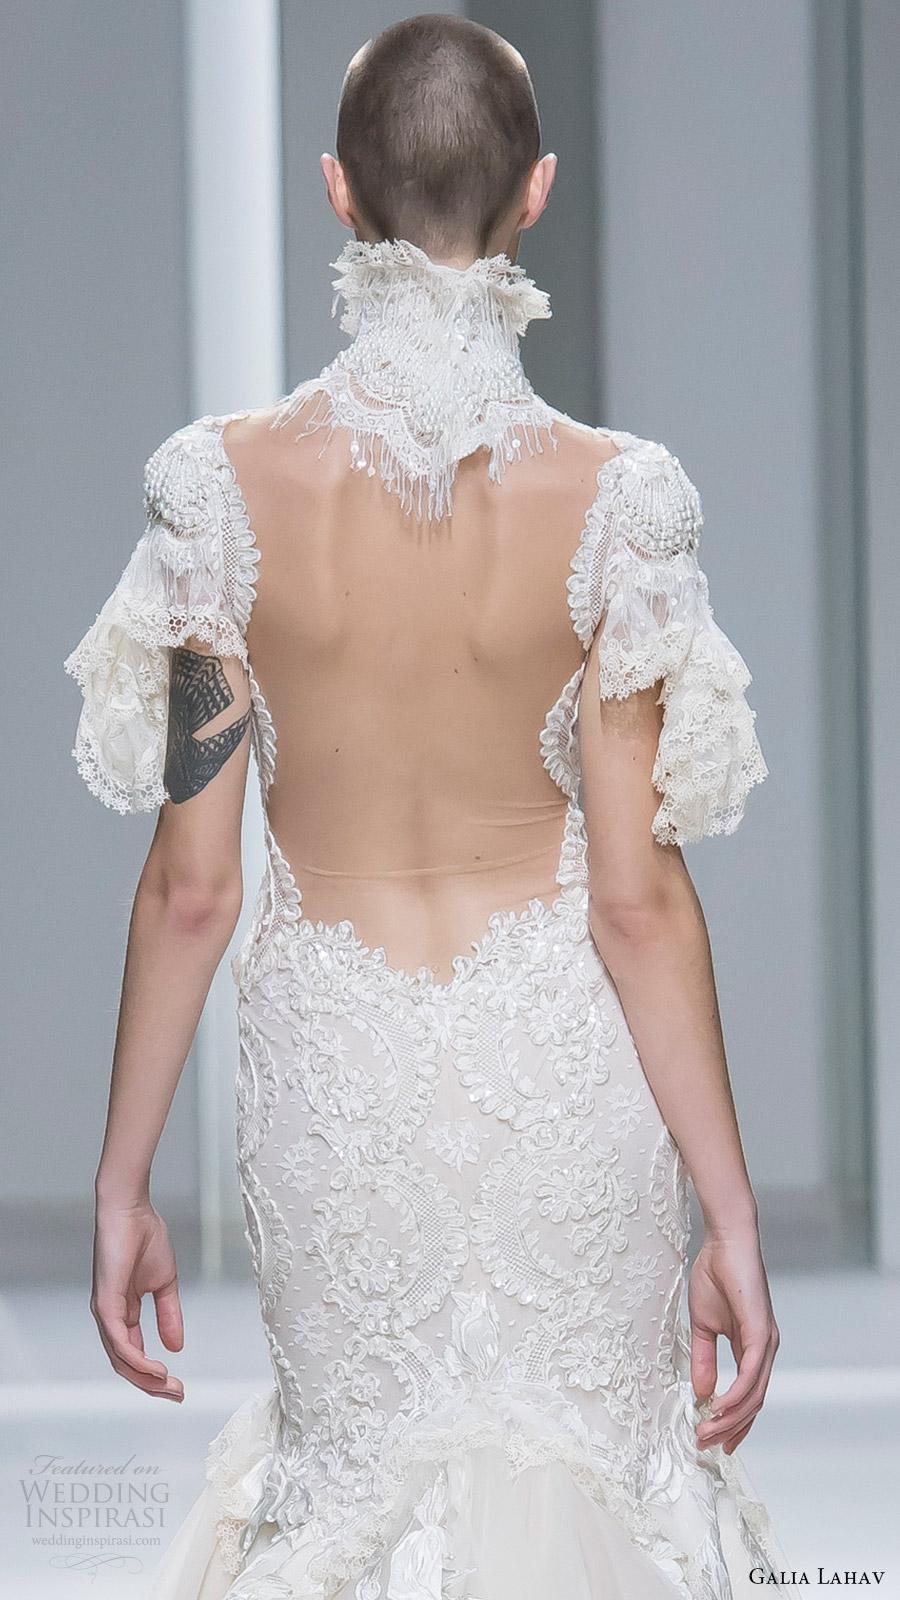 galia lahav haute couture spring 2017 (miss genesis) gown bv